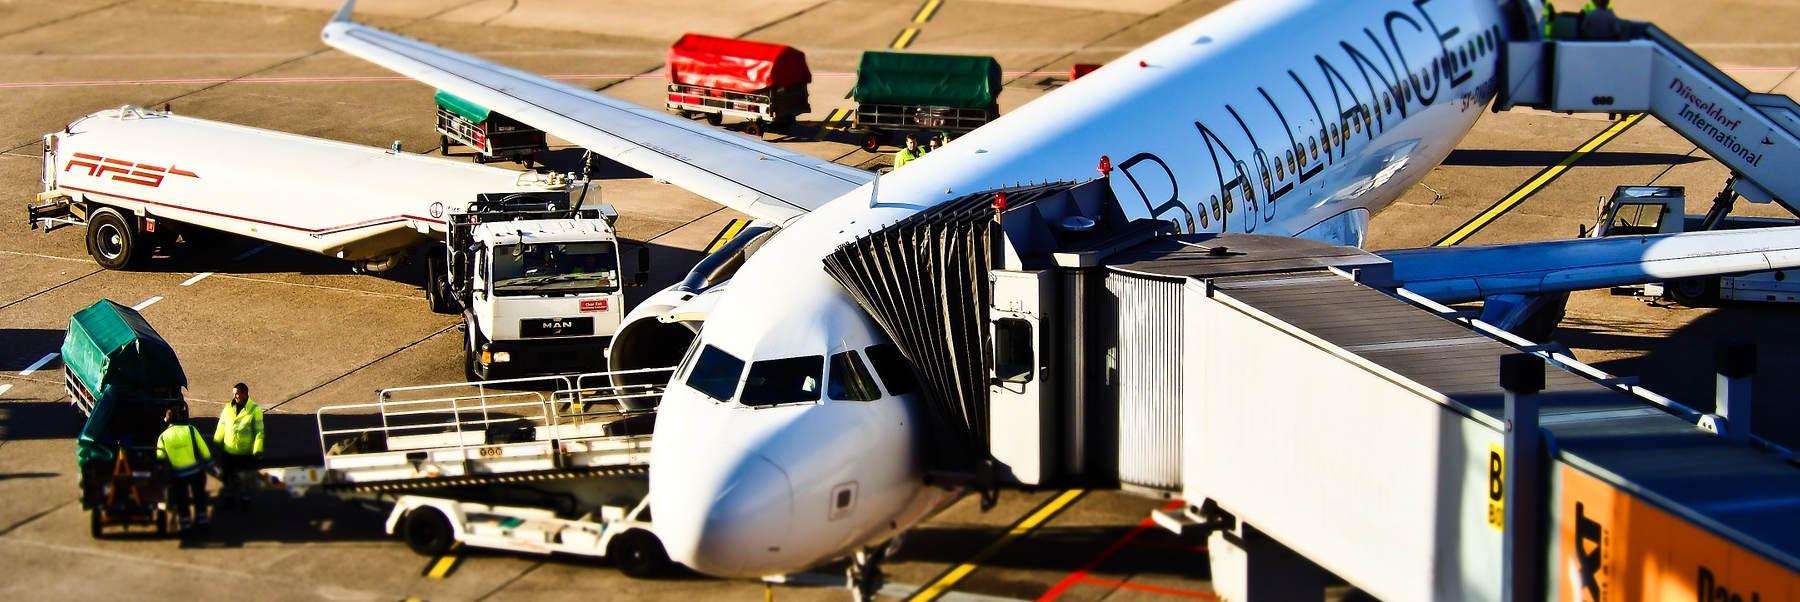 ▷▷▷ Restplätze Flughafen Weeze